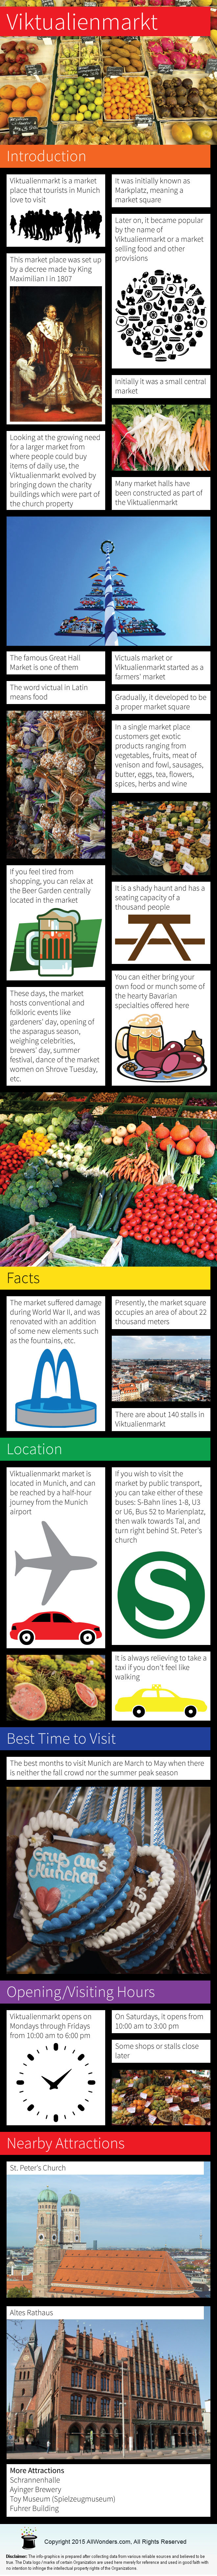 Viktualienmarkt Infographic